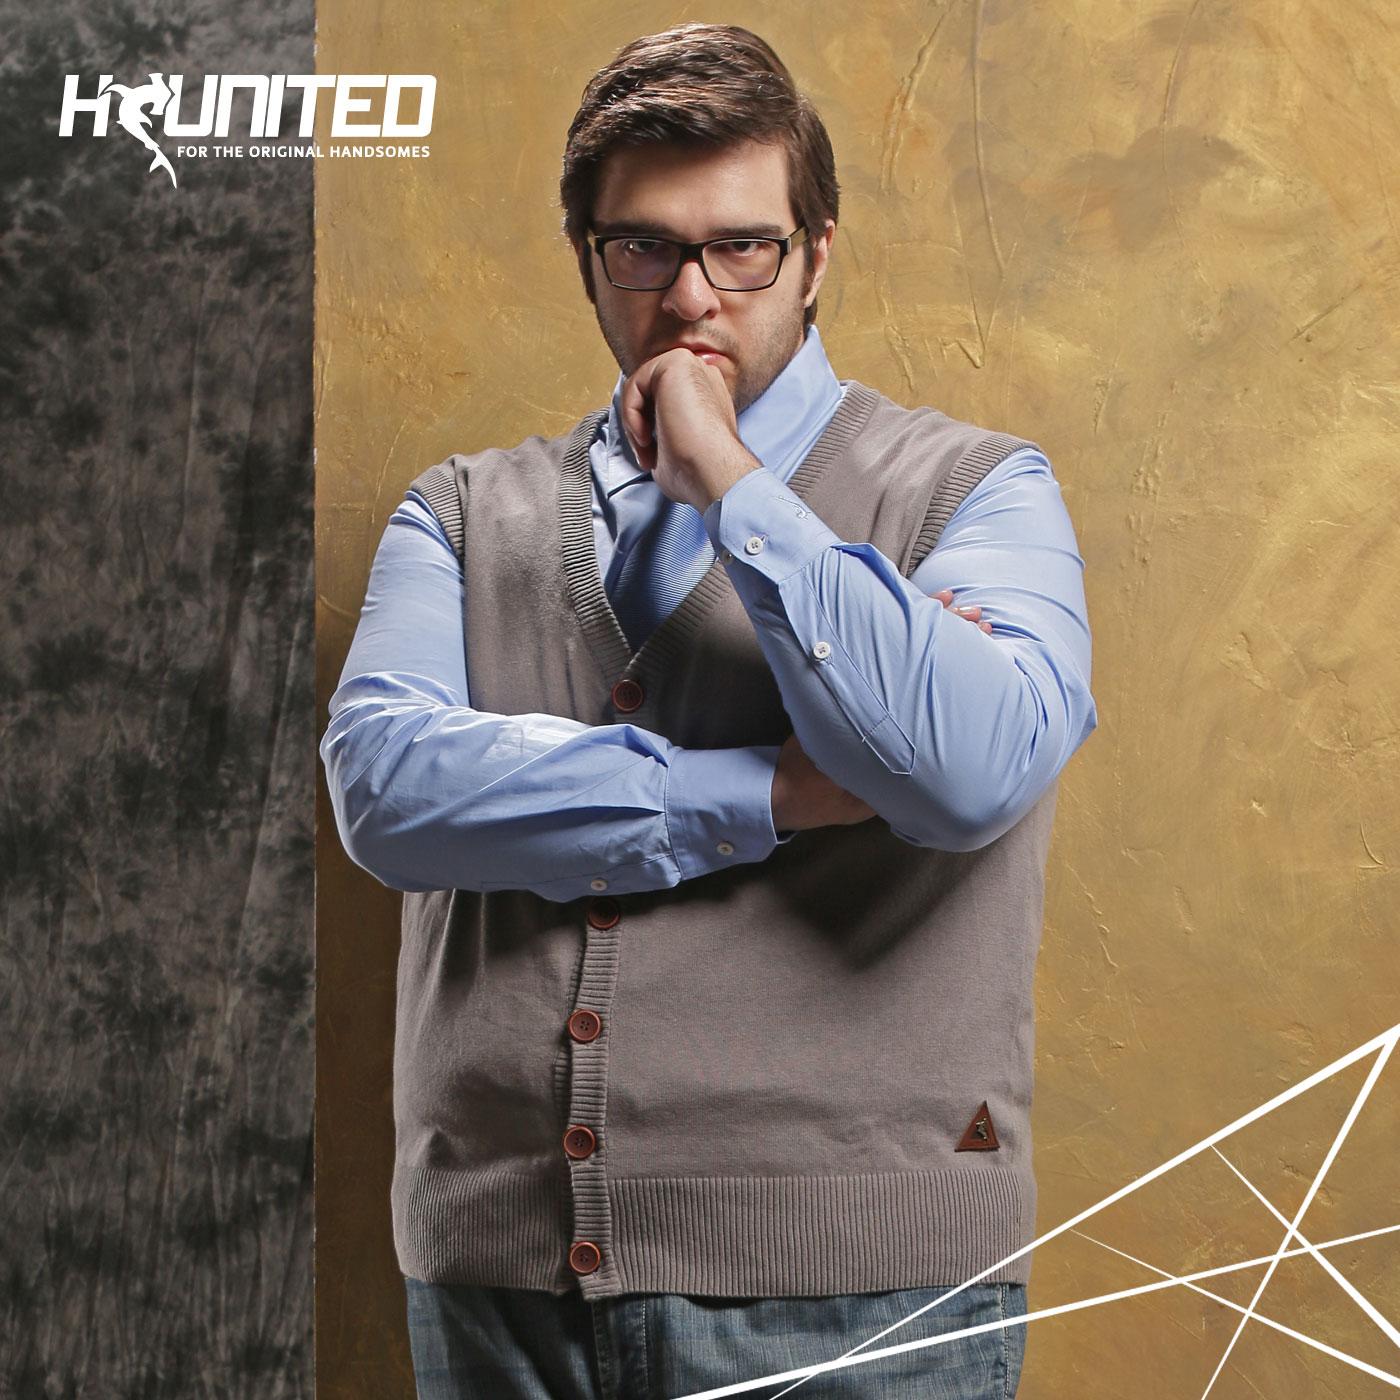 H-UNITED巨鲨大码男装针织背心男加肥加大胖子开衫毛衣背心男宽松